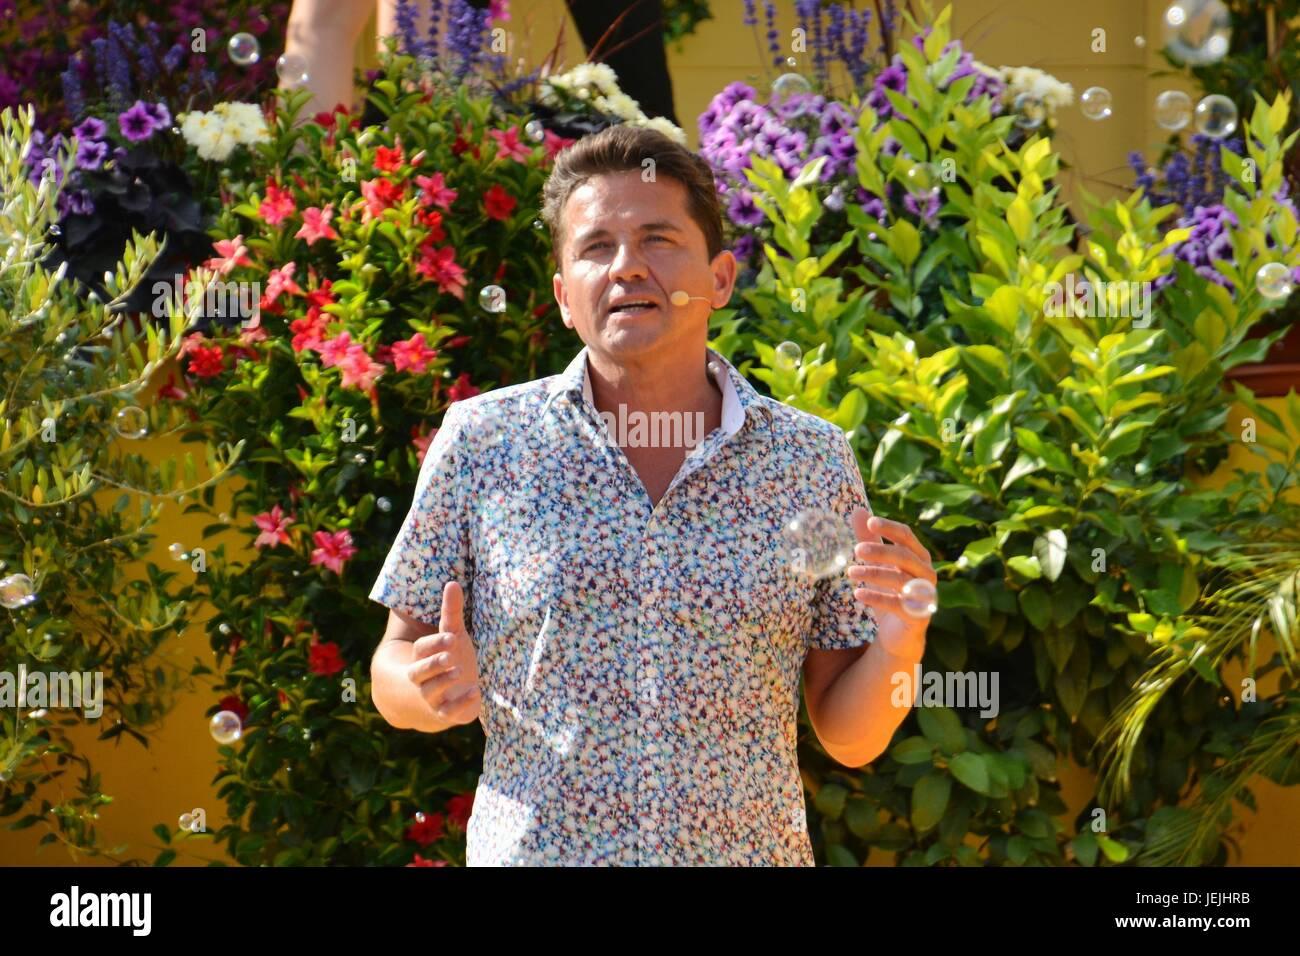 Rust, Germany, 25th June, 20017, Das Erste ARD TV Show 'Immer wieder Sonntags' Credit: mediensegel/Alamy - Stock Image